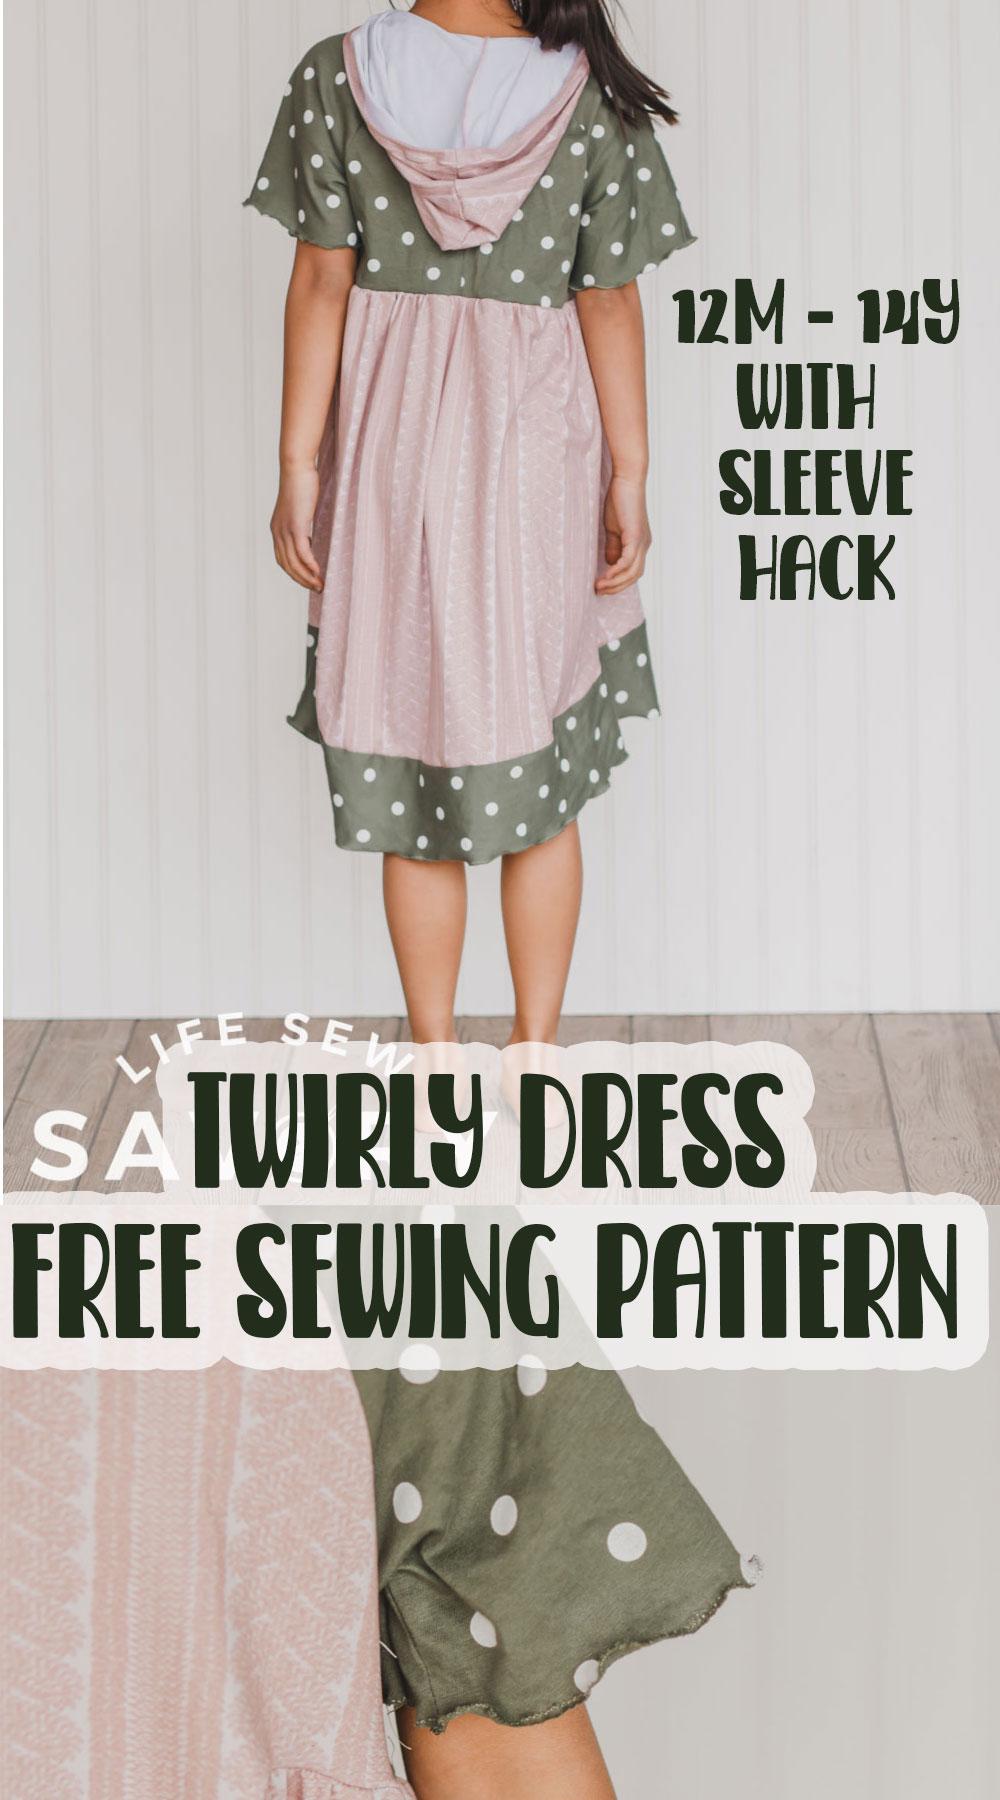 sew a dress with a free pattern